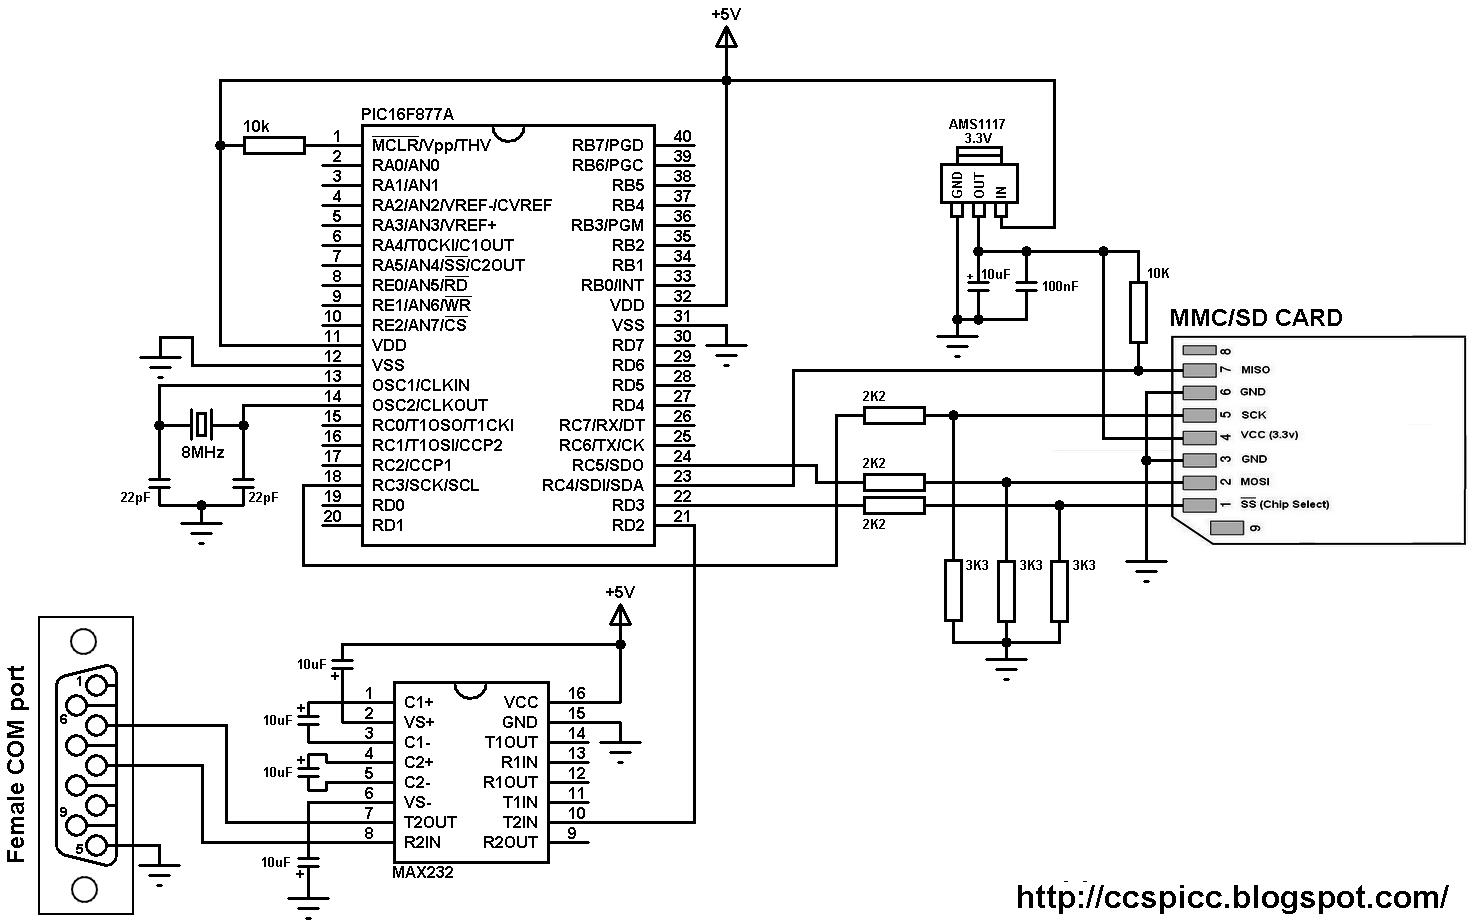 MMC/SD Card raw data read using PIC16F877A microcontroller